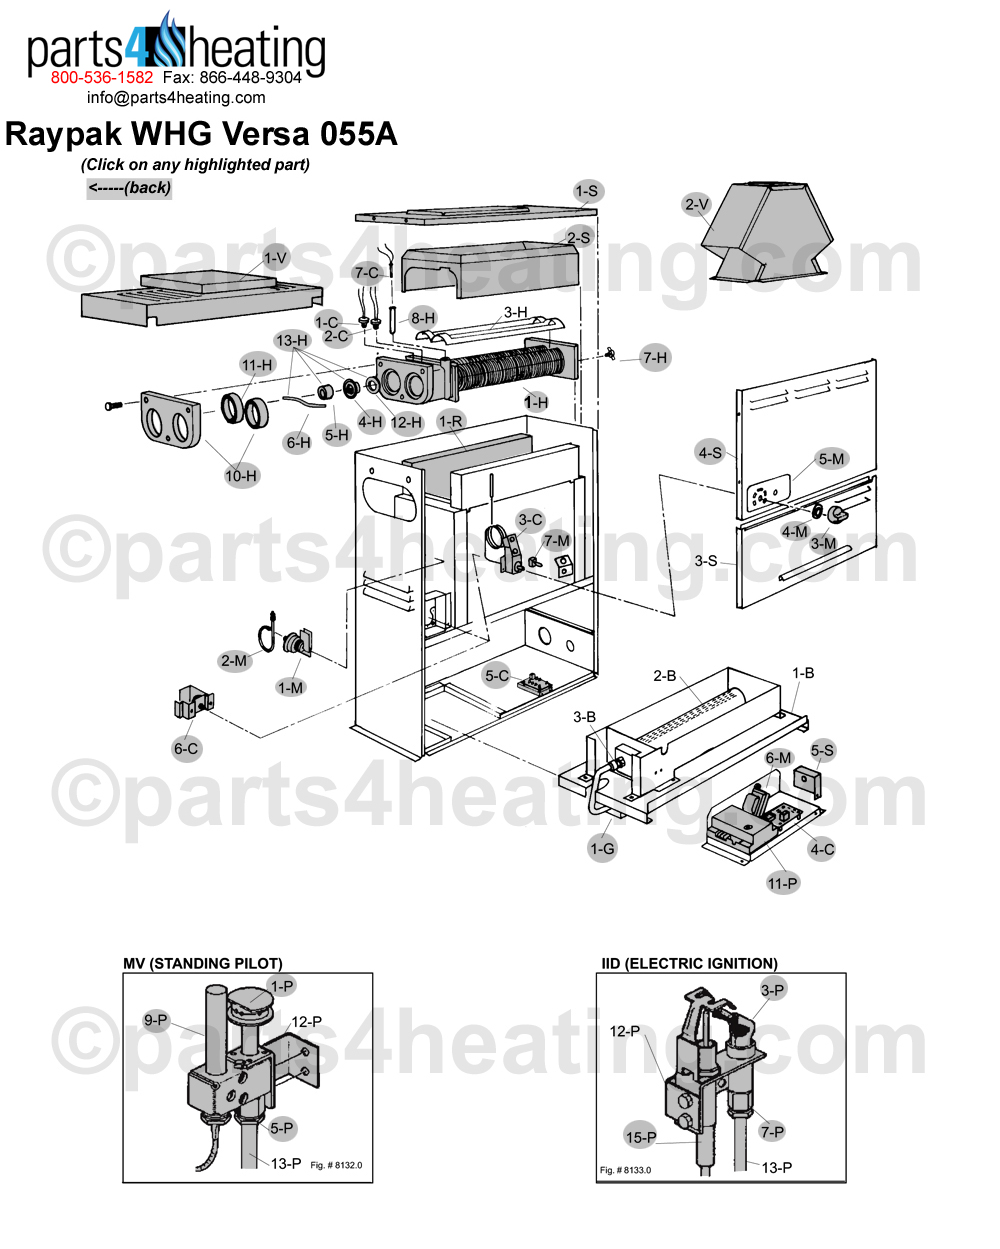 Raypak WHG Versa 055A